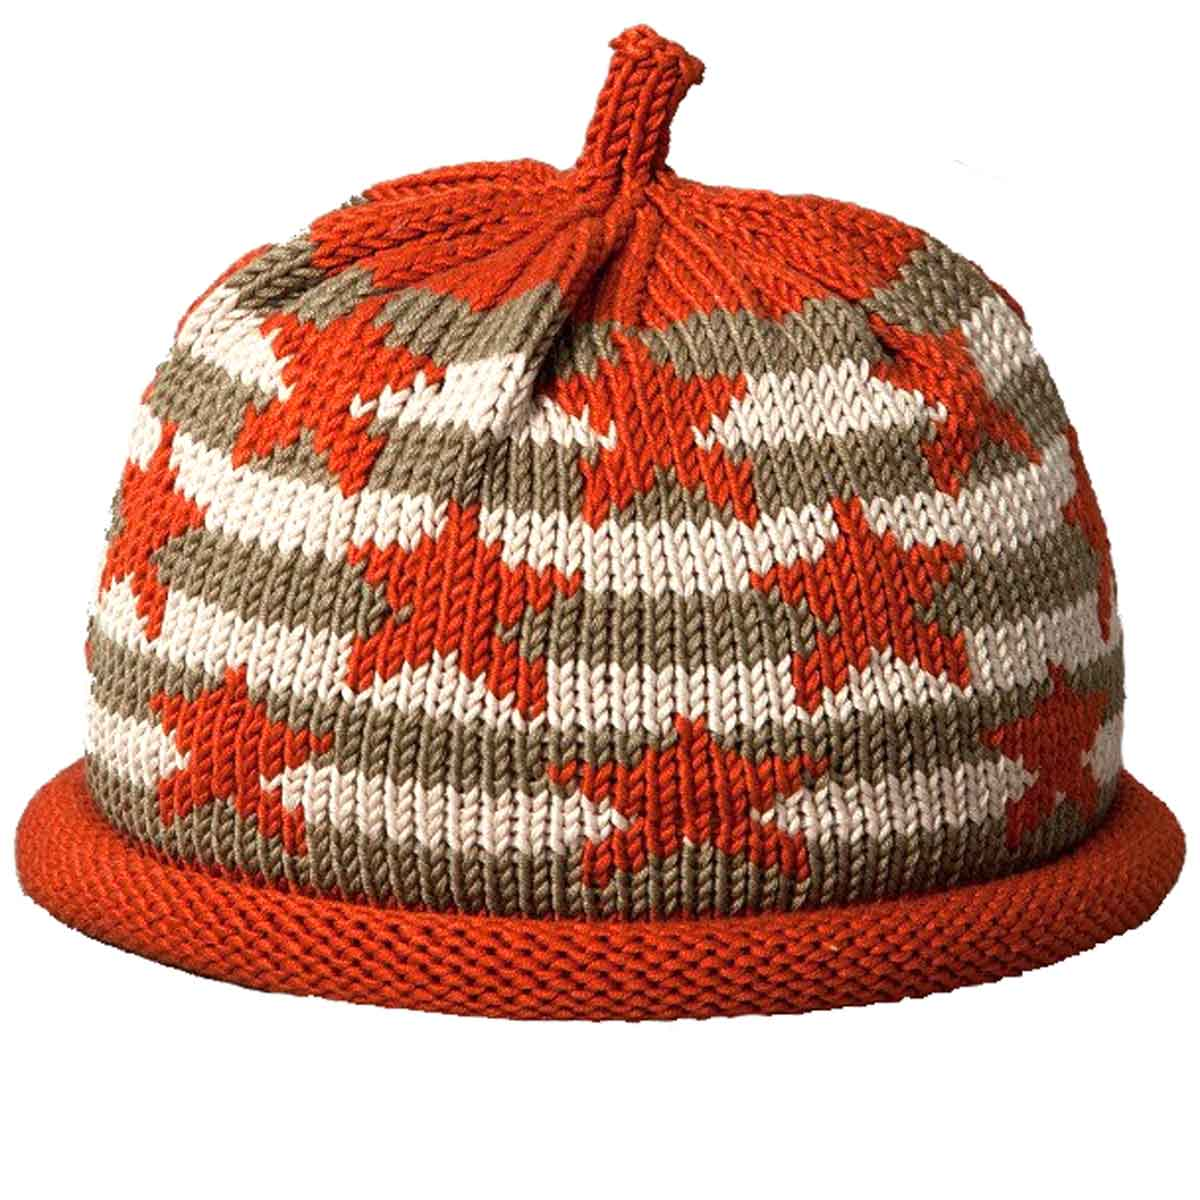 5857d1d93ba Falling Stars Rust on Khaki Striped Knit Hat - Margareta Horn Design